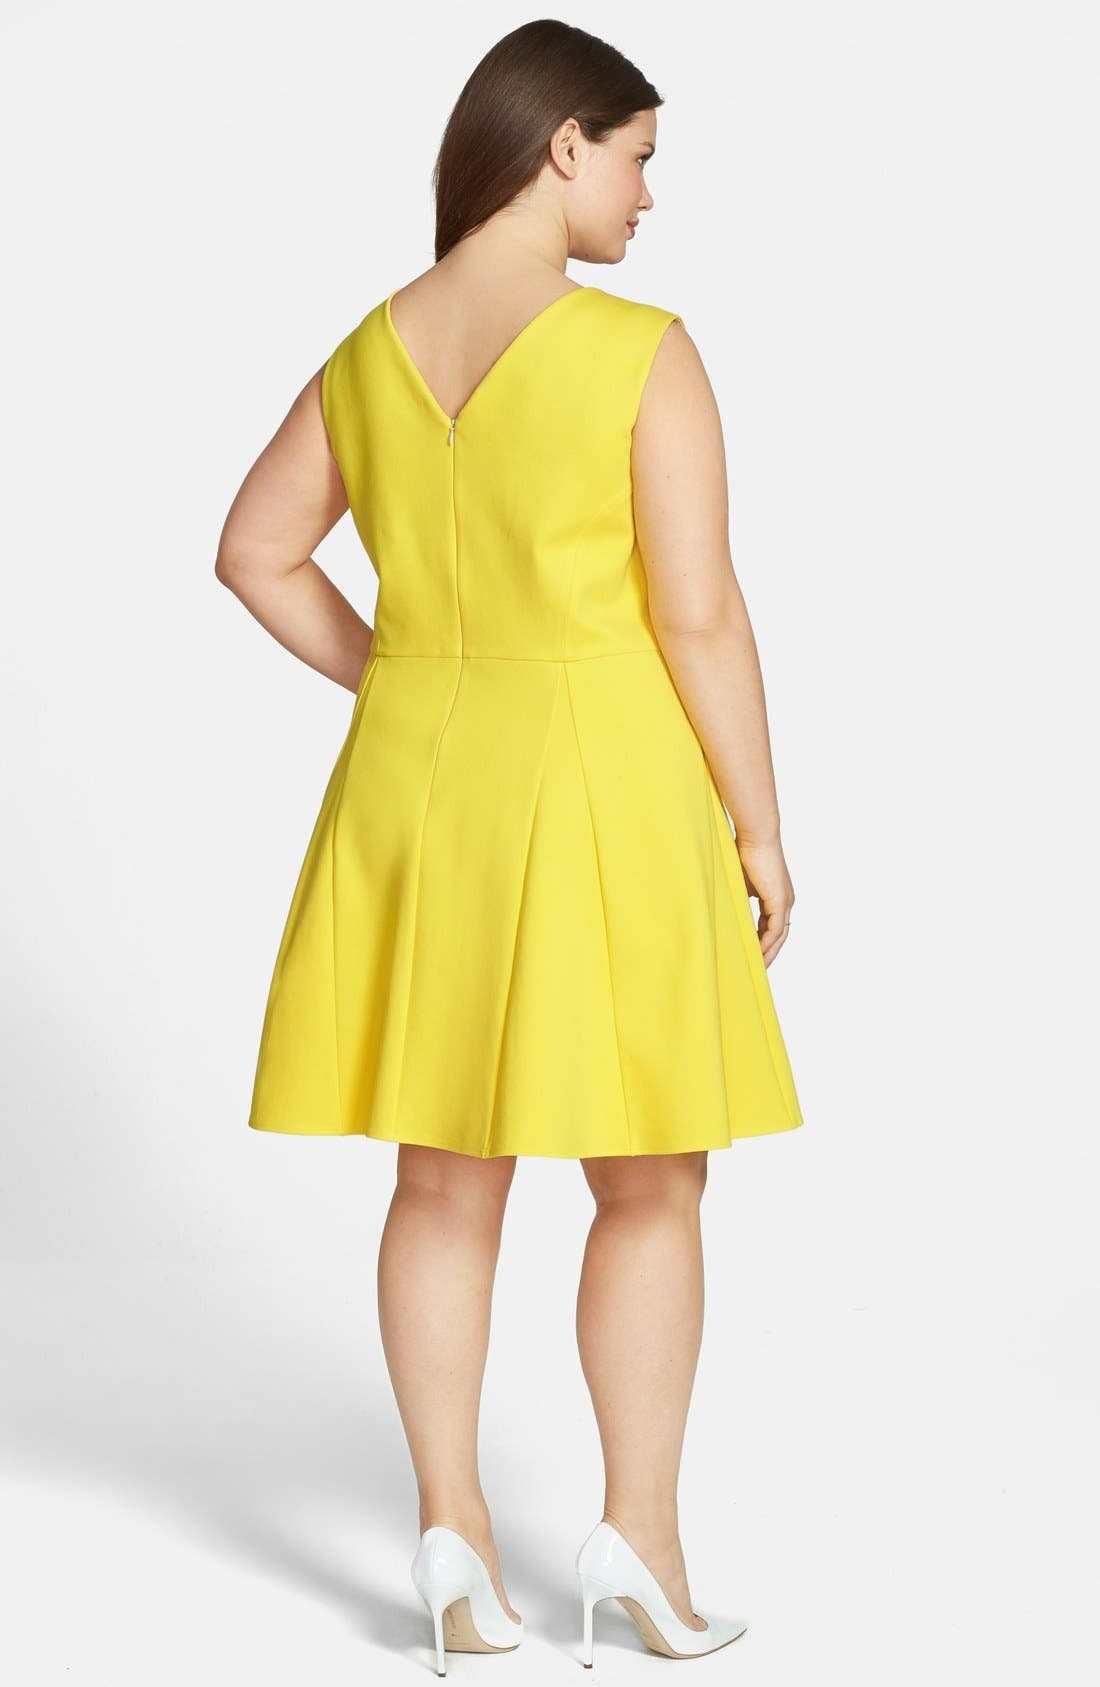 Alternate Image 2  - ABS by Allen Schwartz Sleeveless Fit & Flare Dress (Plus Size)